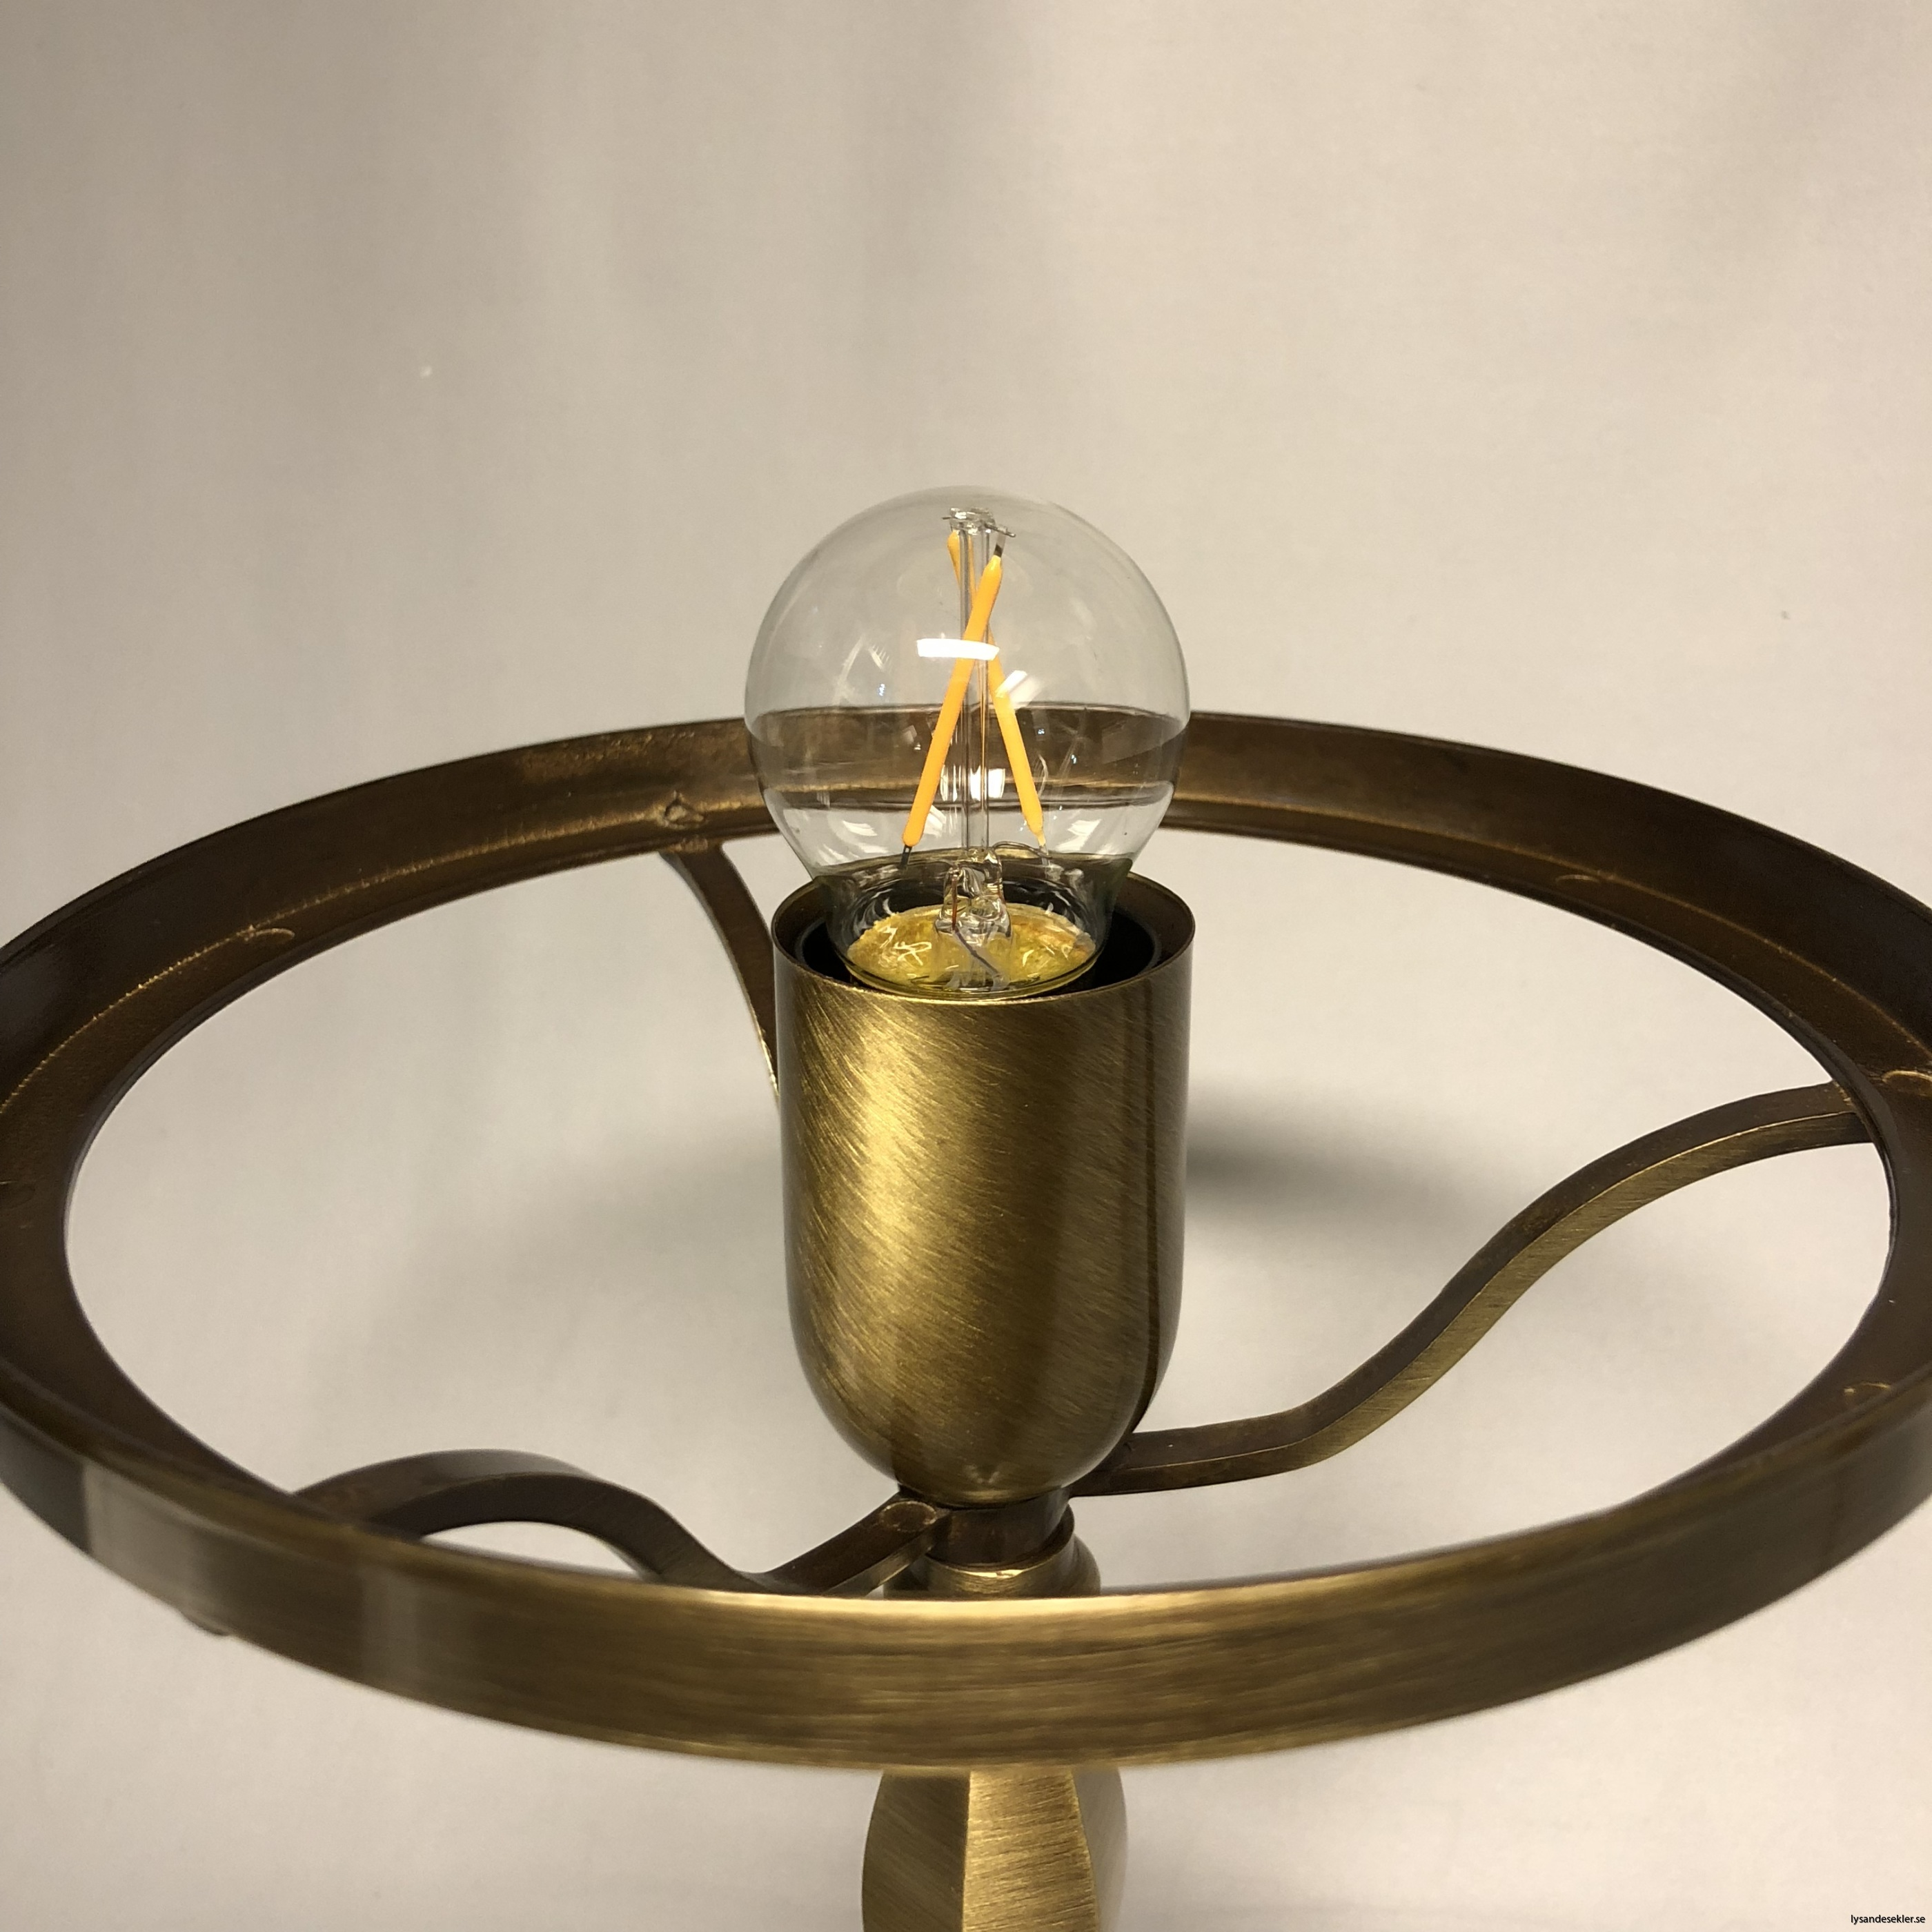 strindbergslampa strindbergslampor strindberg lampa skärm kupa strindbergsskärm strindbergskupa10